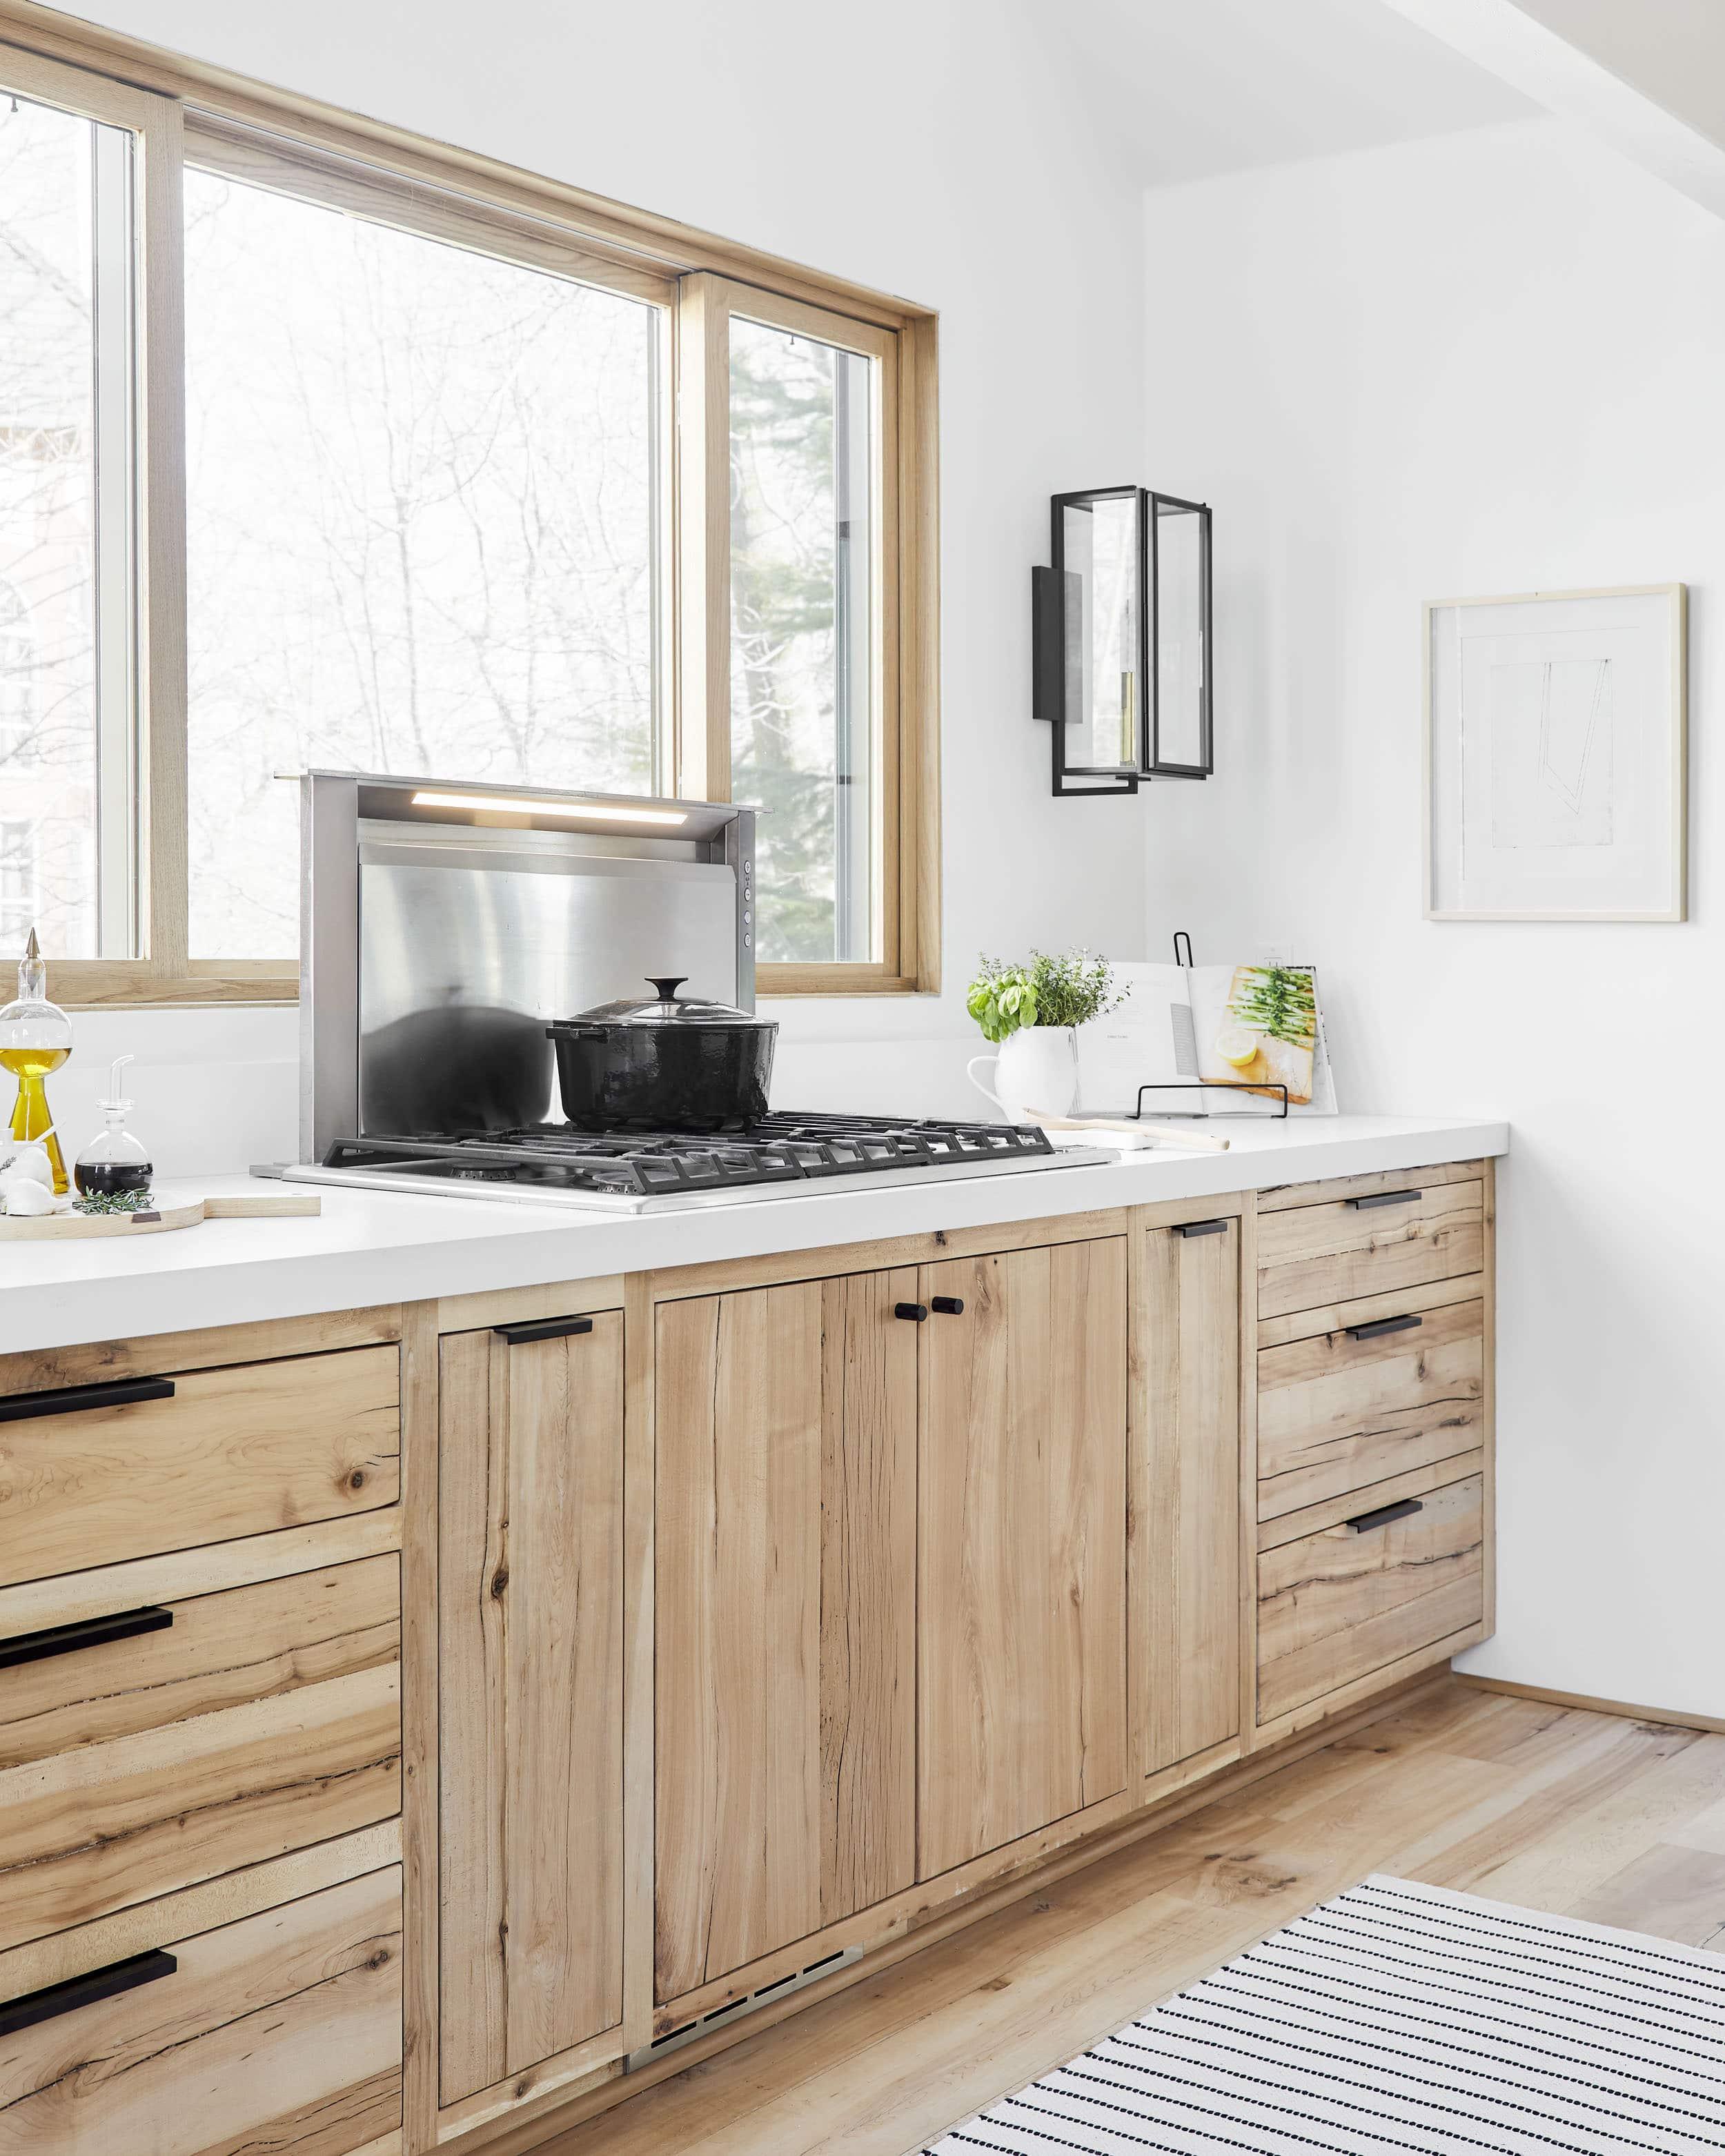 Emily Henderson viking appliances10